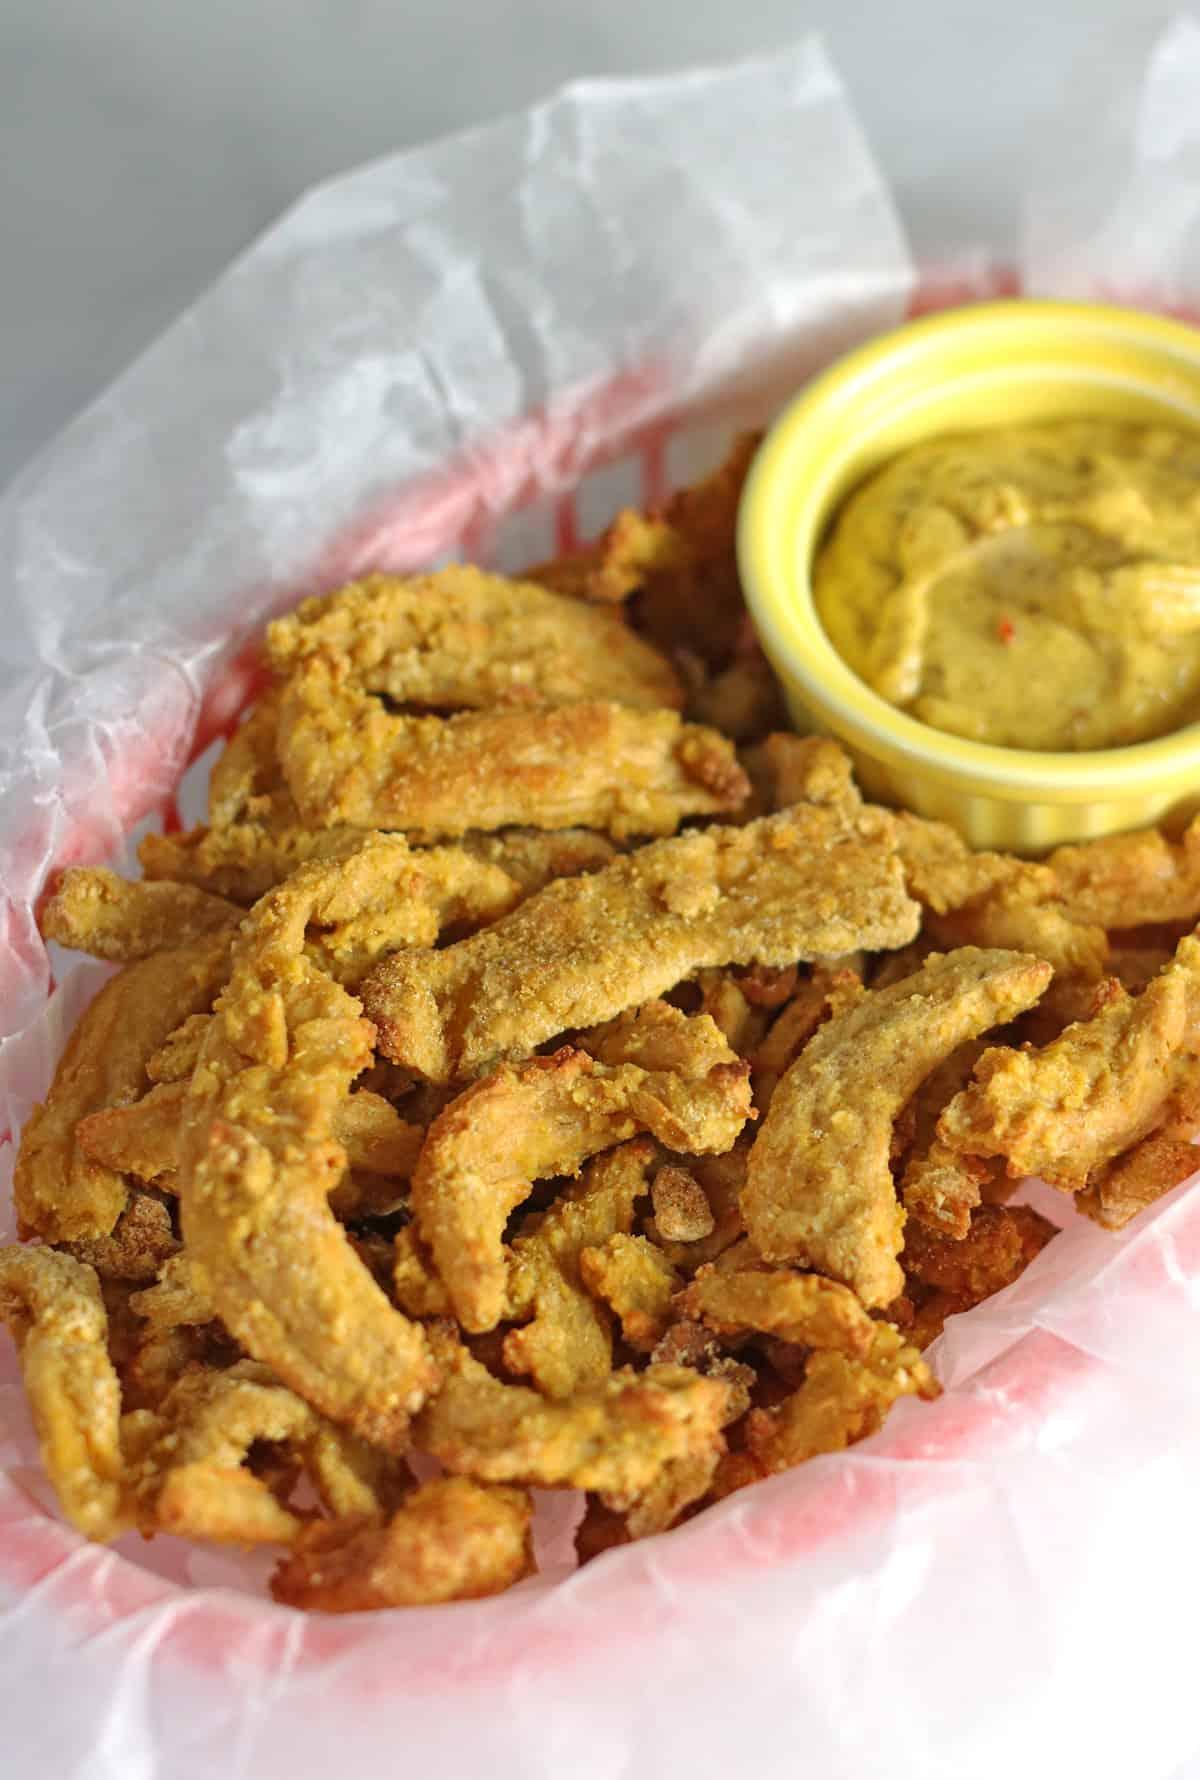 vegan chicken in red basket with mustard dipping sauce